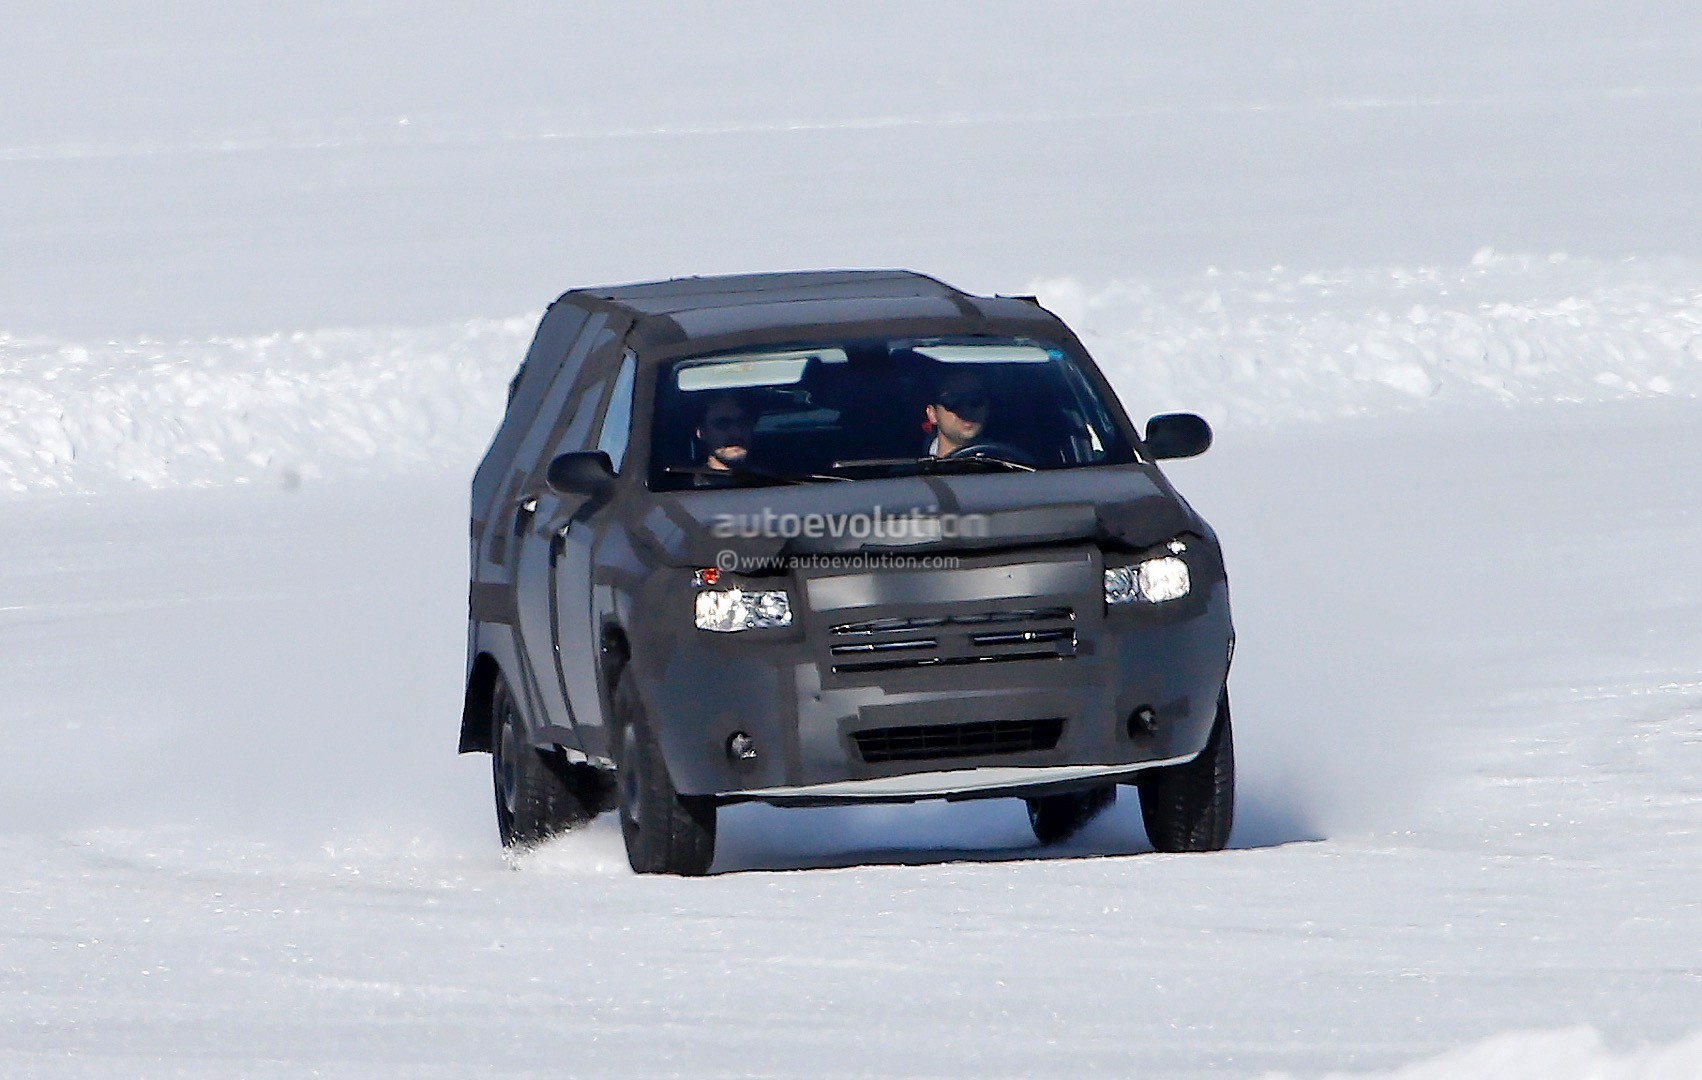 All New Dodge Dakota Mid Size Ram Pickup Truck Spied Testing Photo Gallery on Dodge Ram Regular